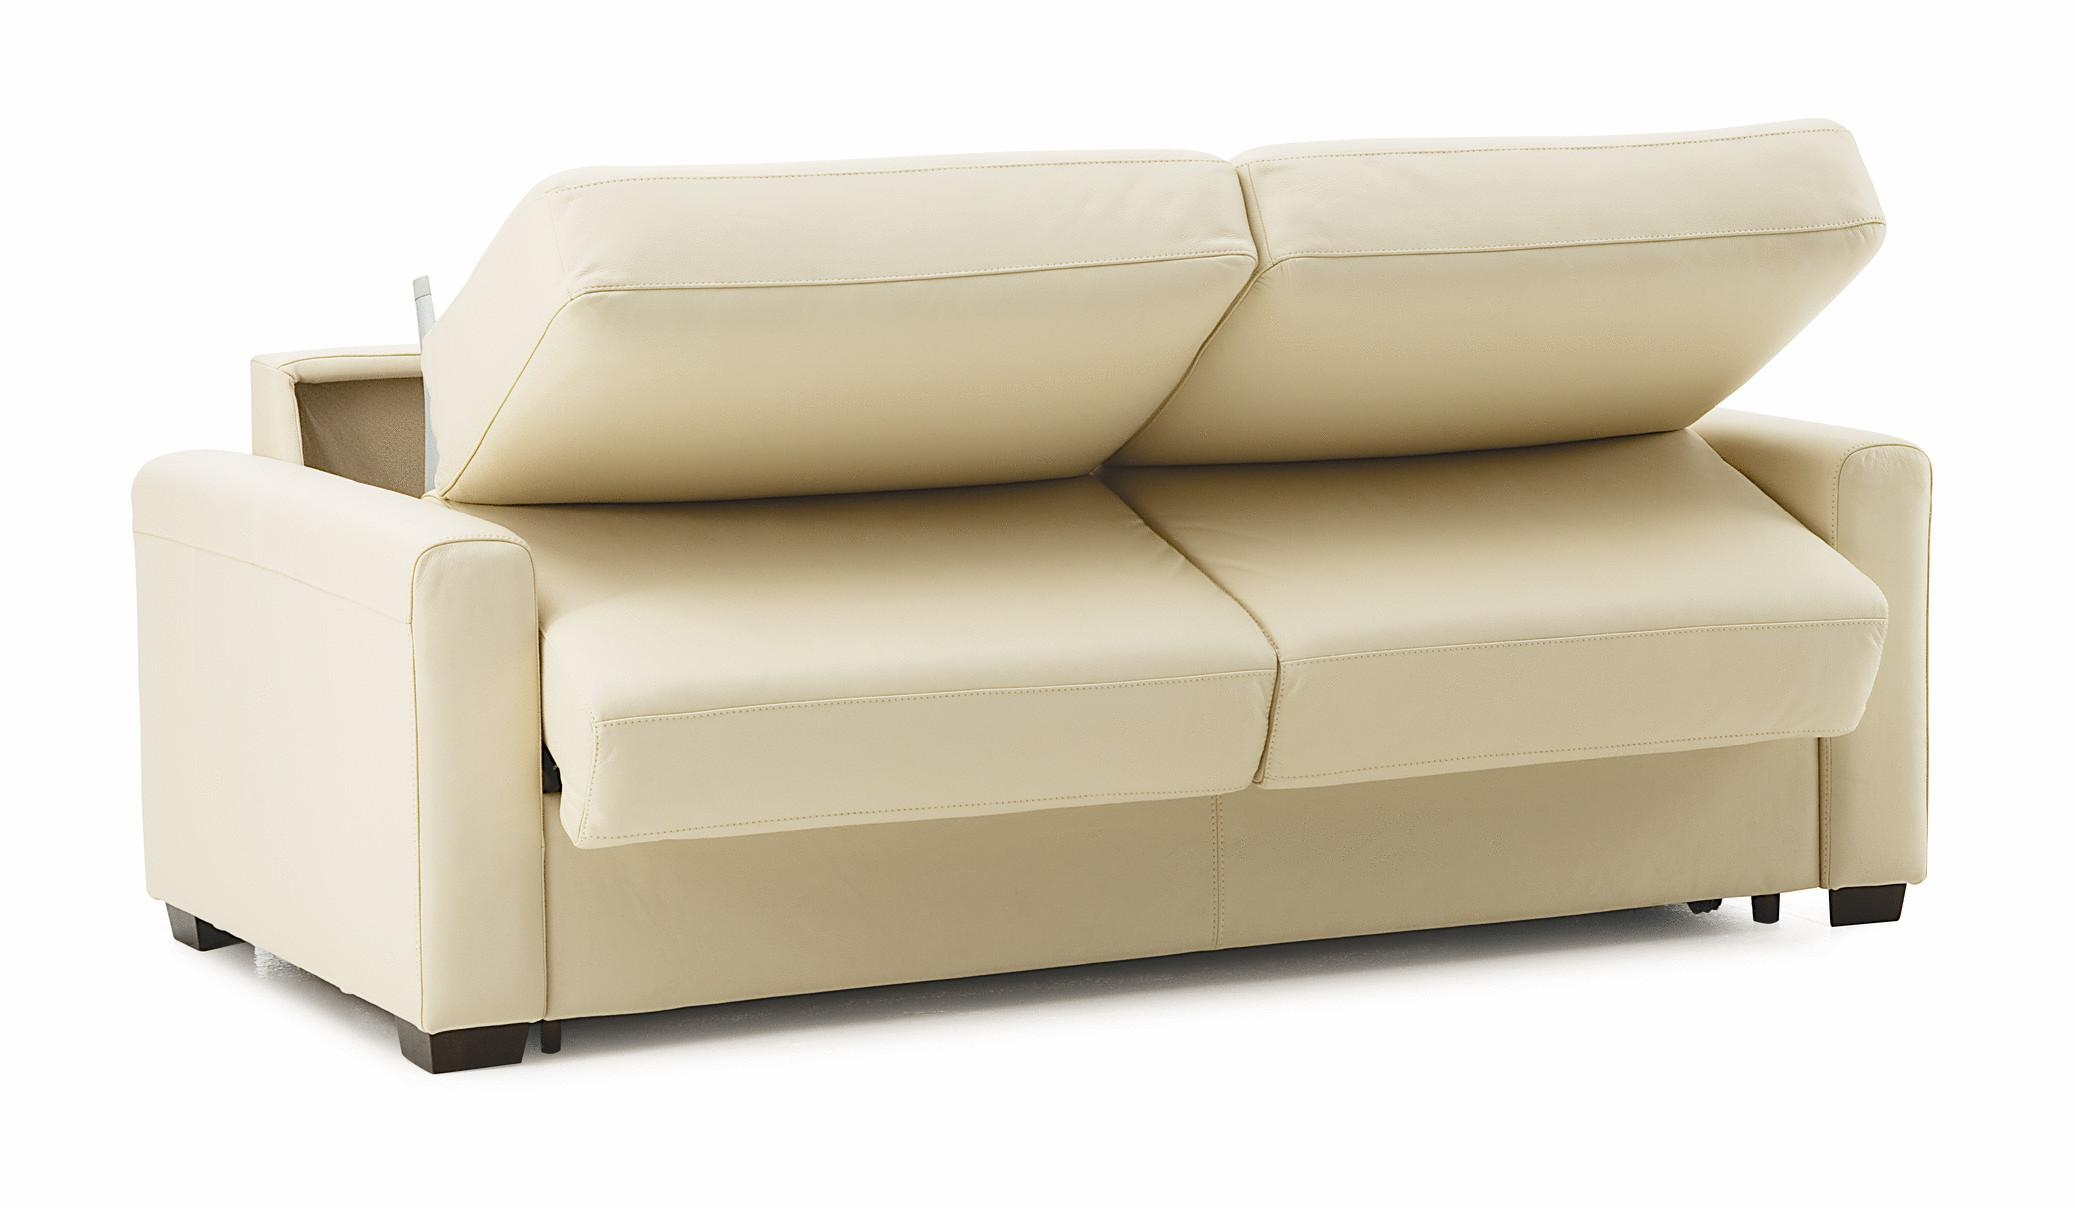 Sleeper Sofa Everyday Use – Page 3 – Webforfreaks Inside Everyday Sleeper Sofas (View 9 of 20)